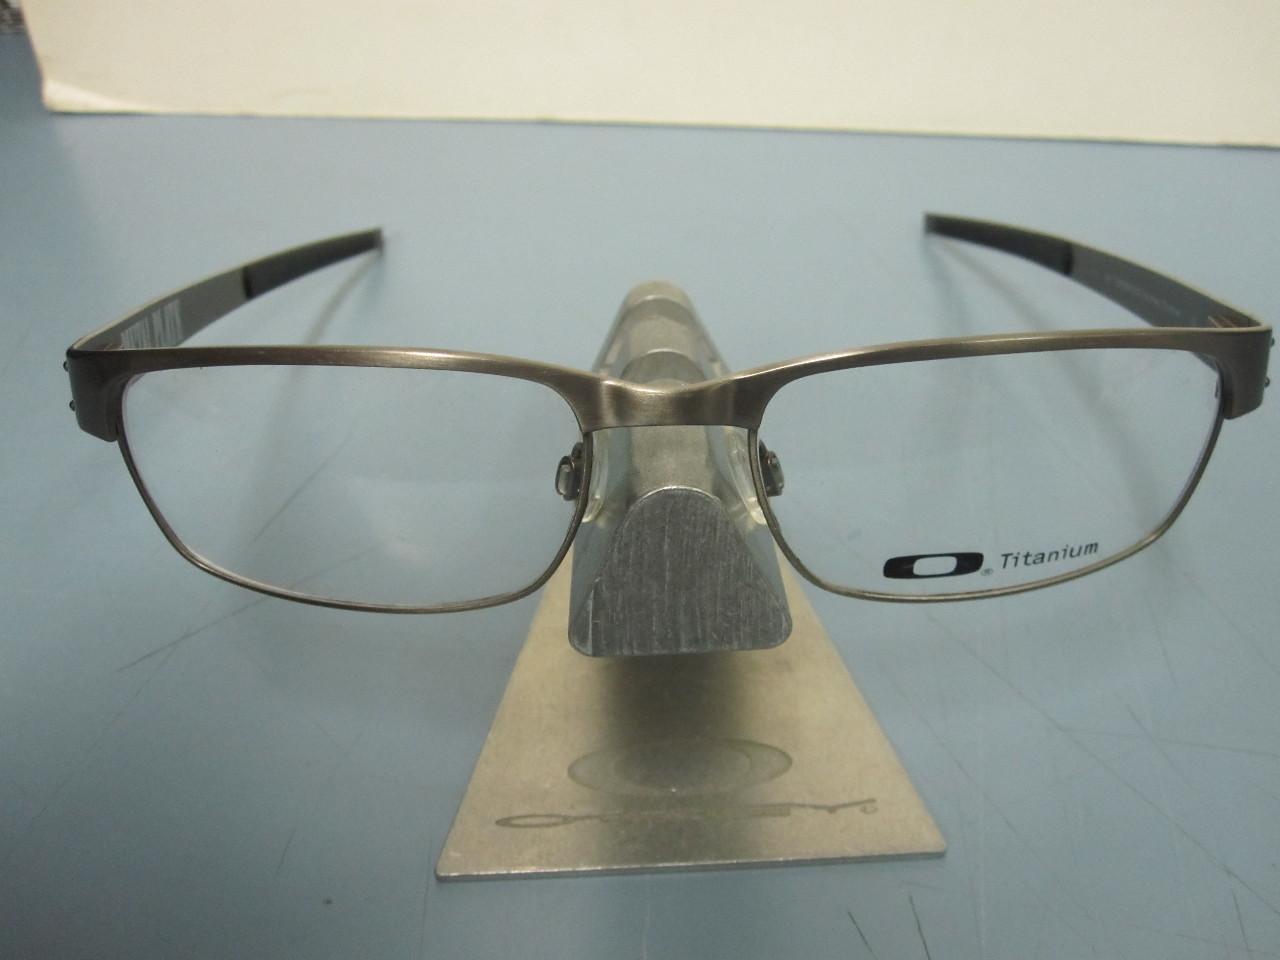 1fff126d317 OAKLEY mens METAL PLATE  brushed chrome  55 RX eyeglass frame ~NEW w  ...